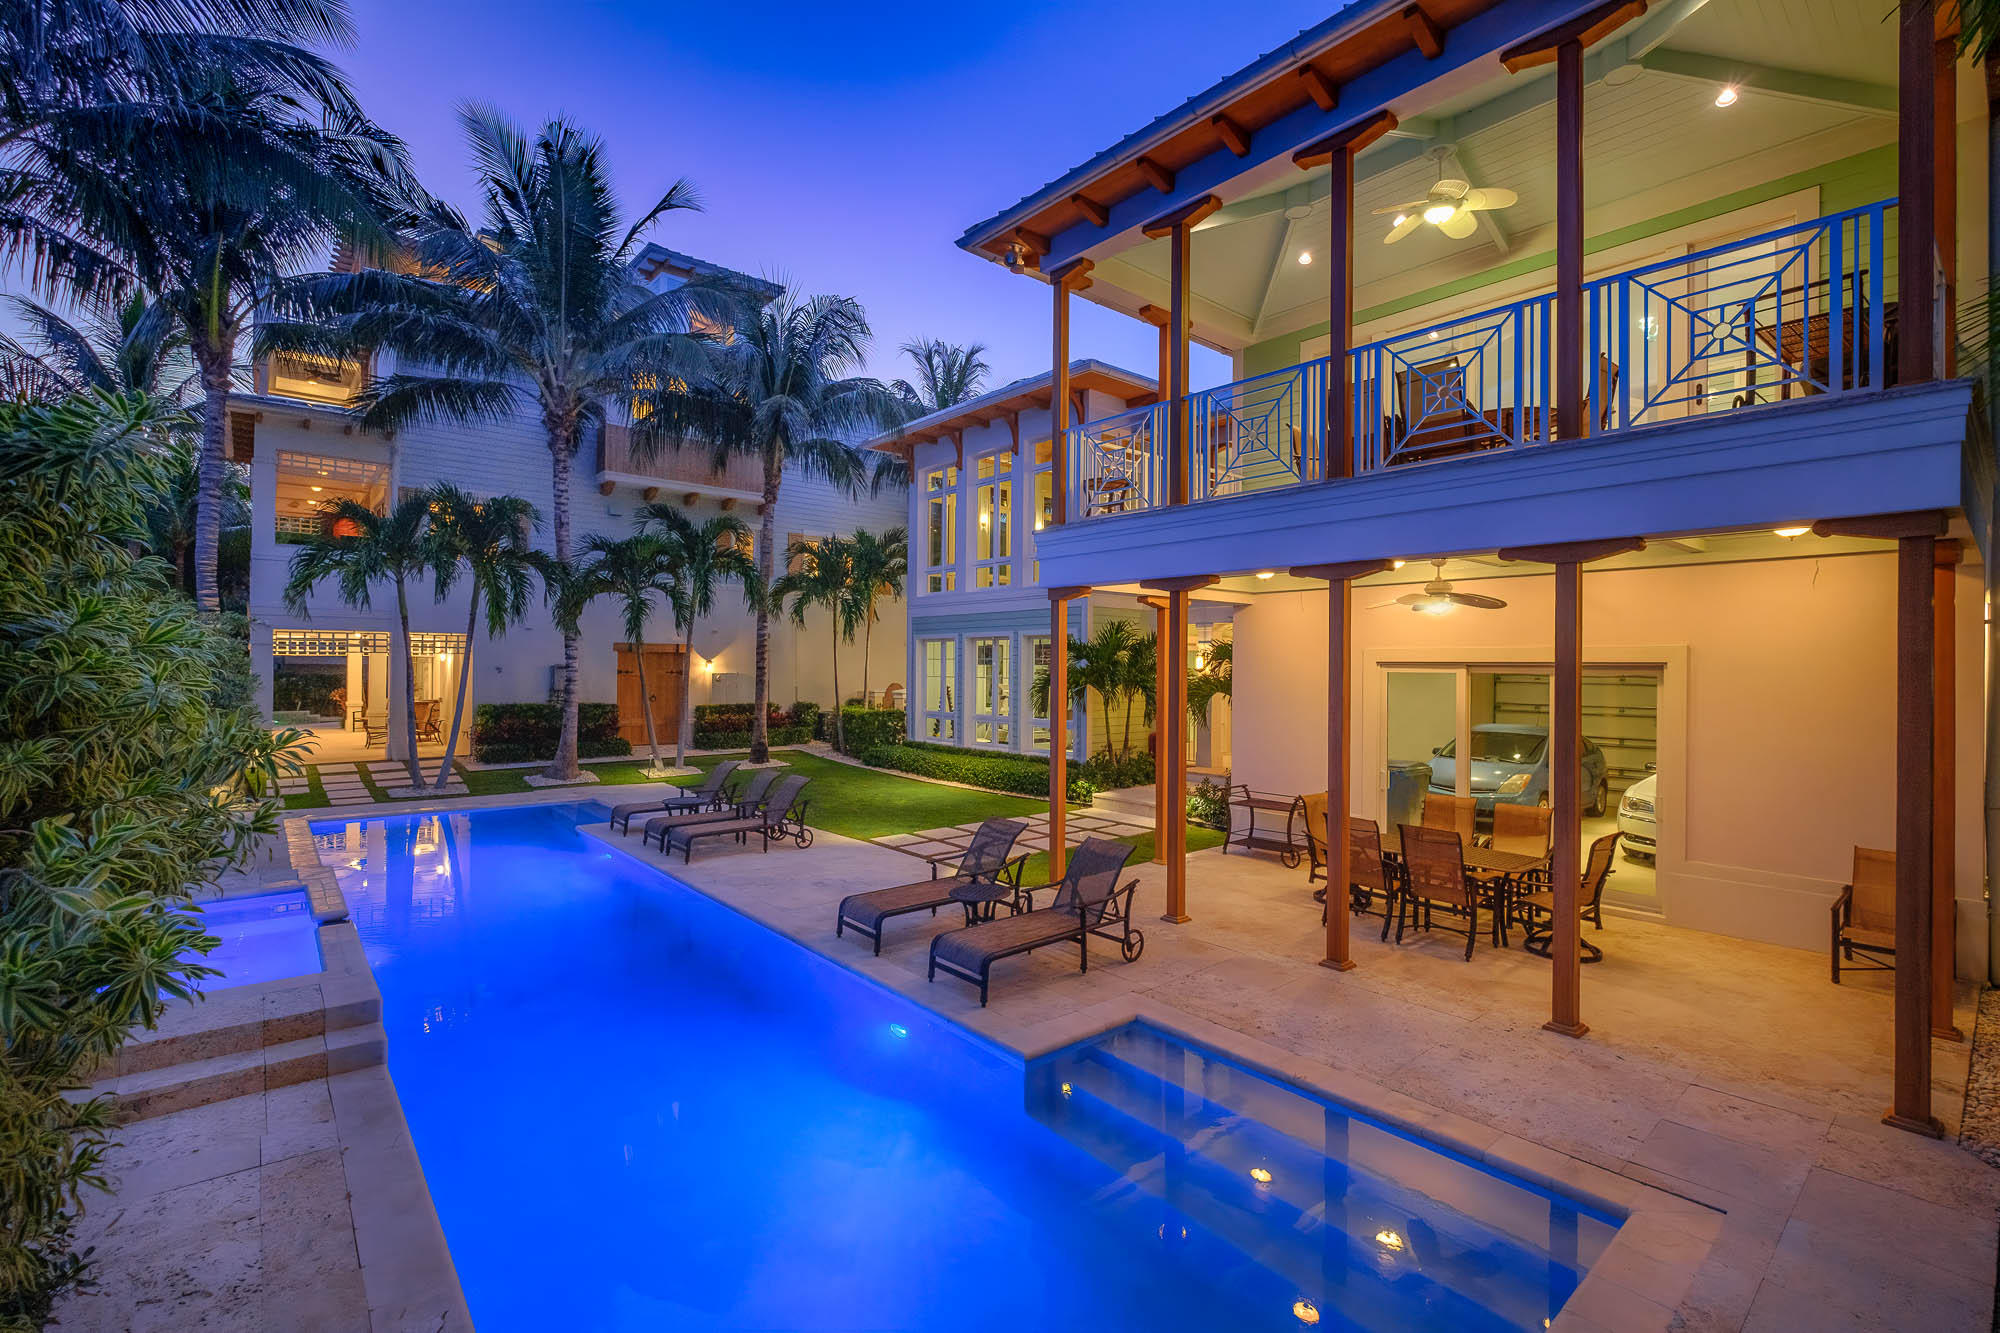 950 Lago Mar Ln, Boca Raton, FL 33431